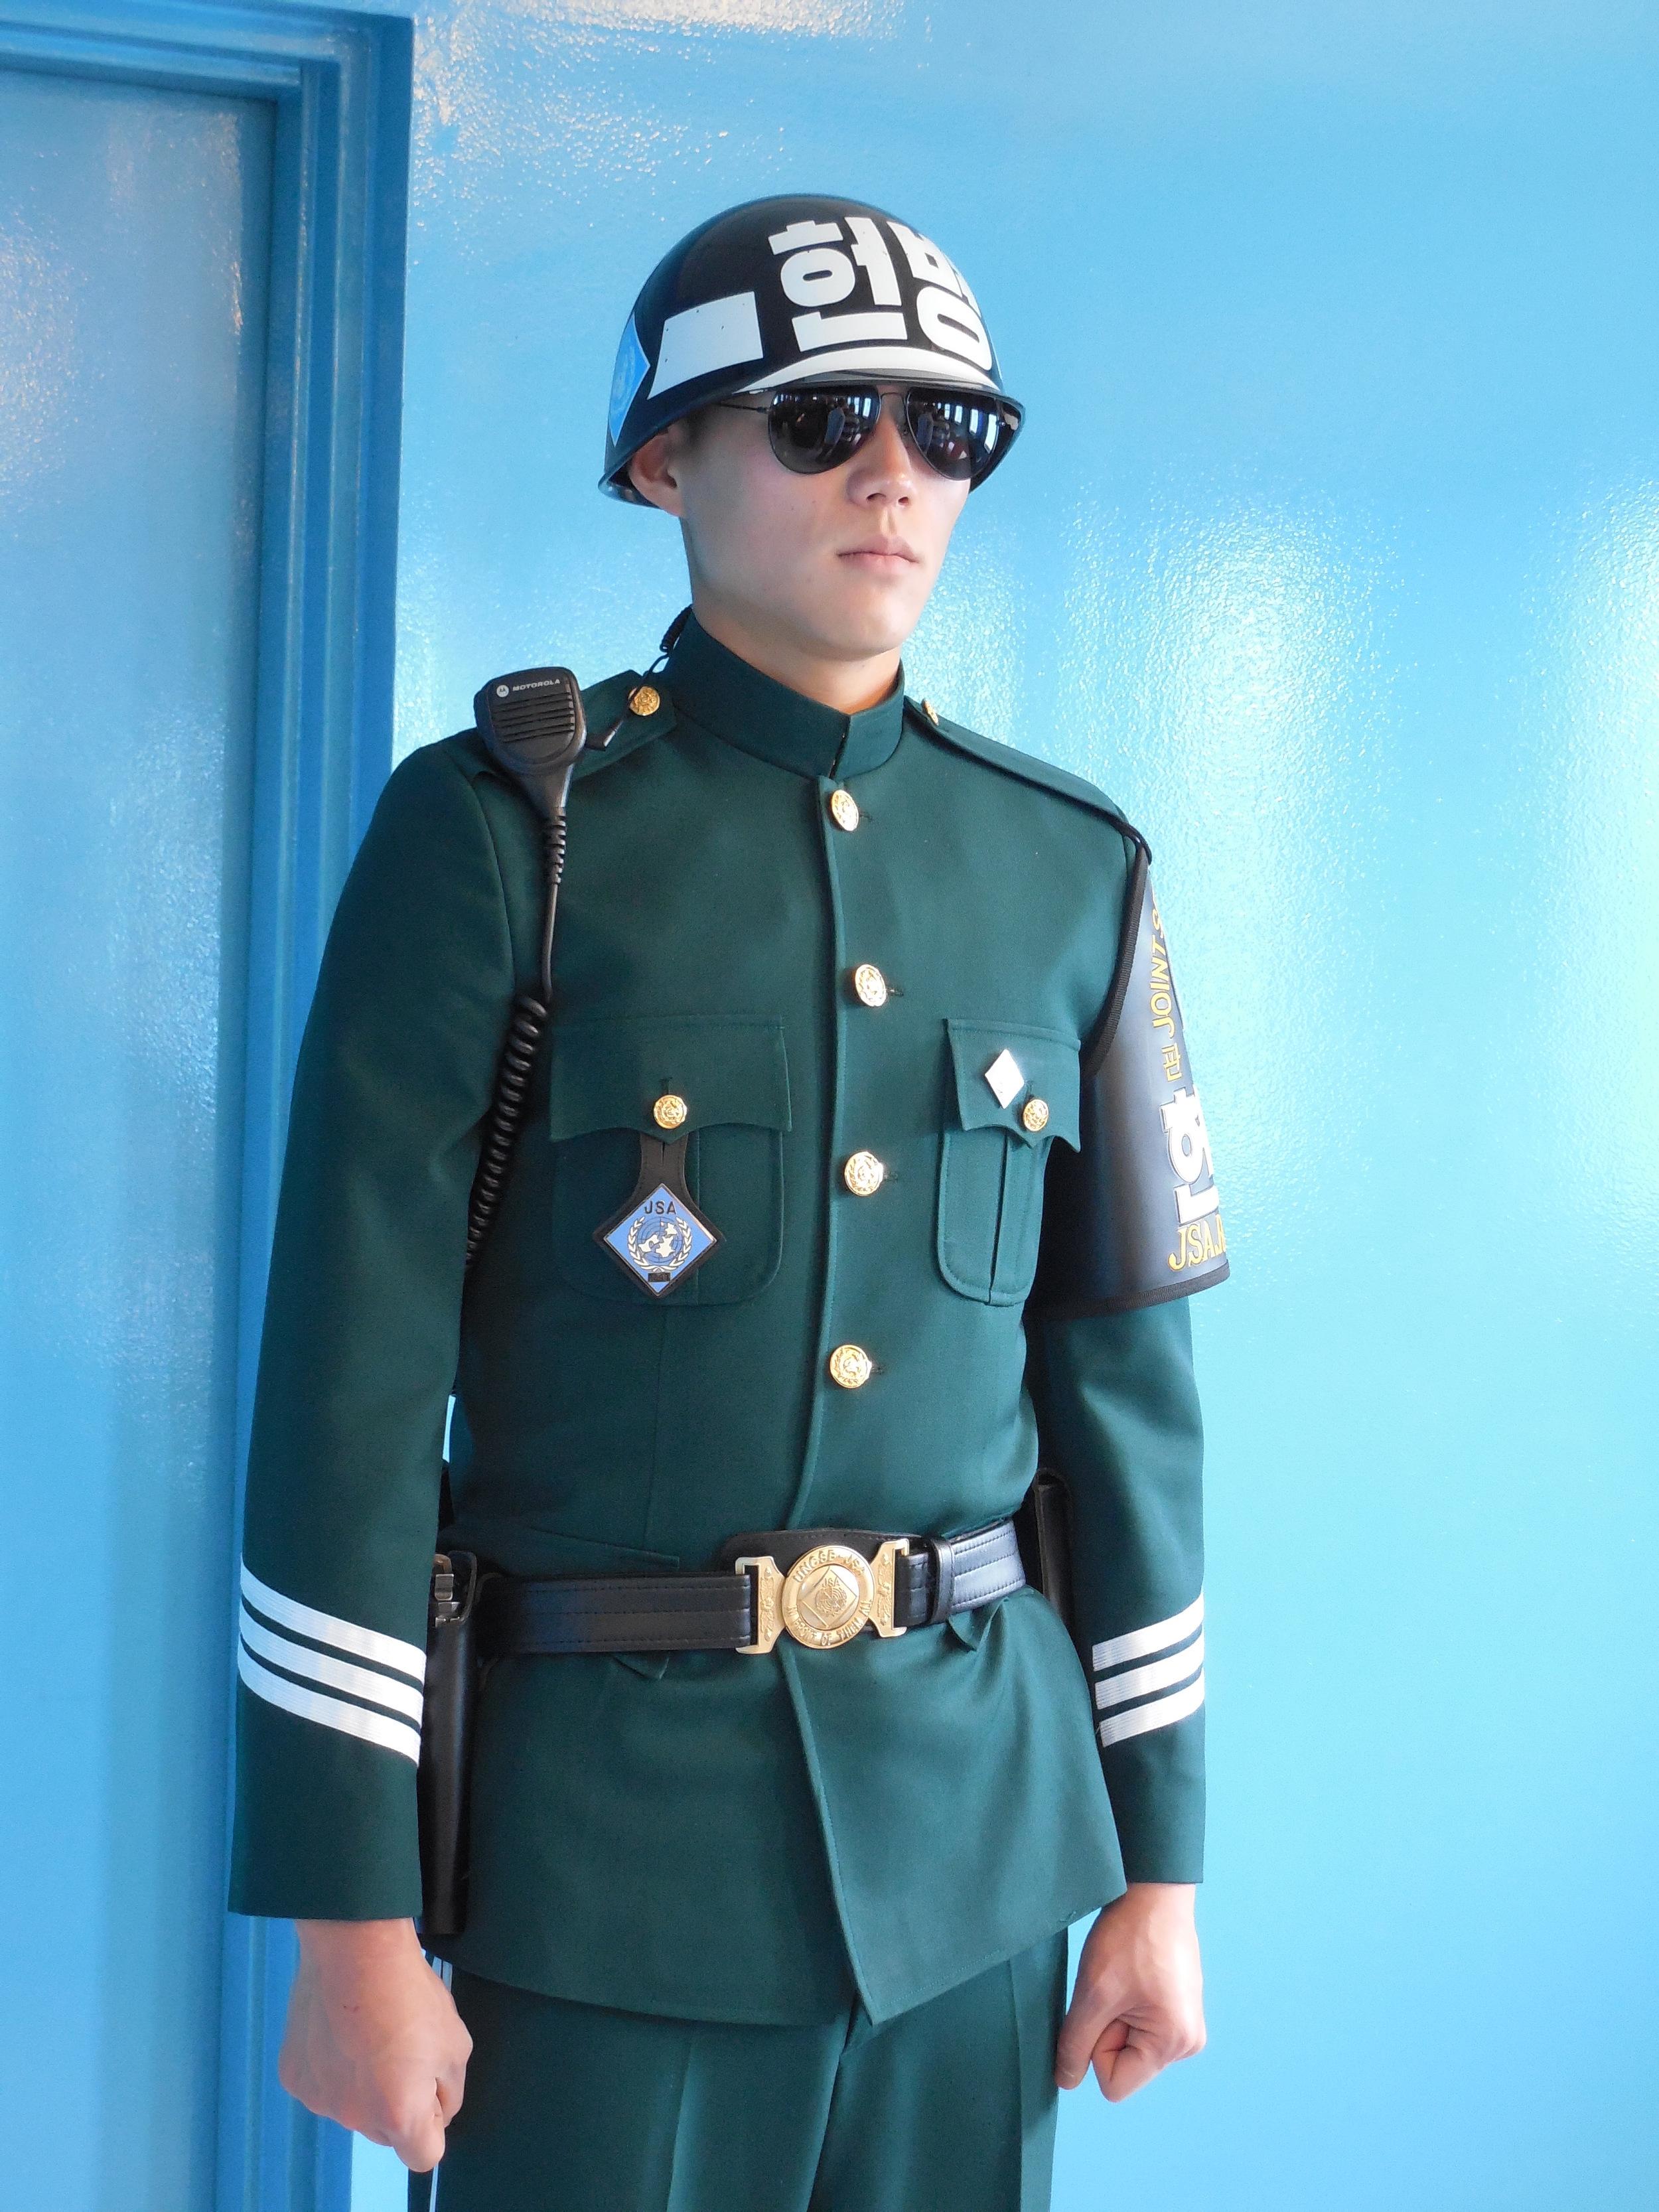 ROK Military DMZ 2015 © Flyga Twiga LLC